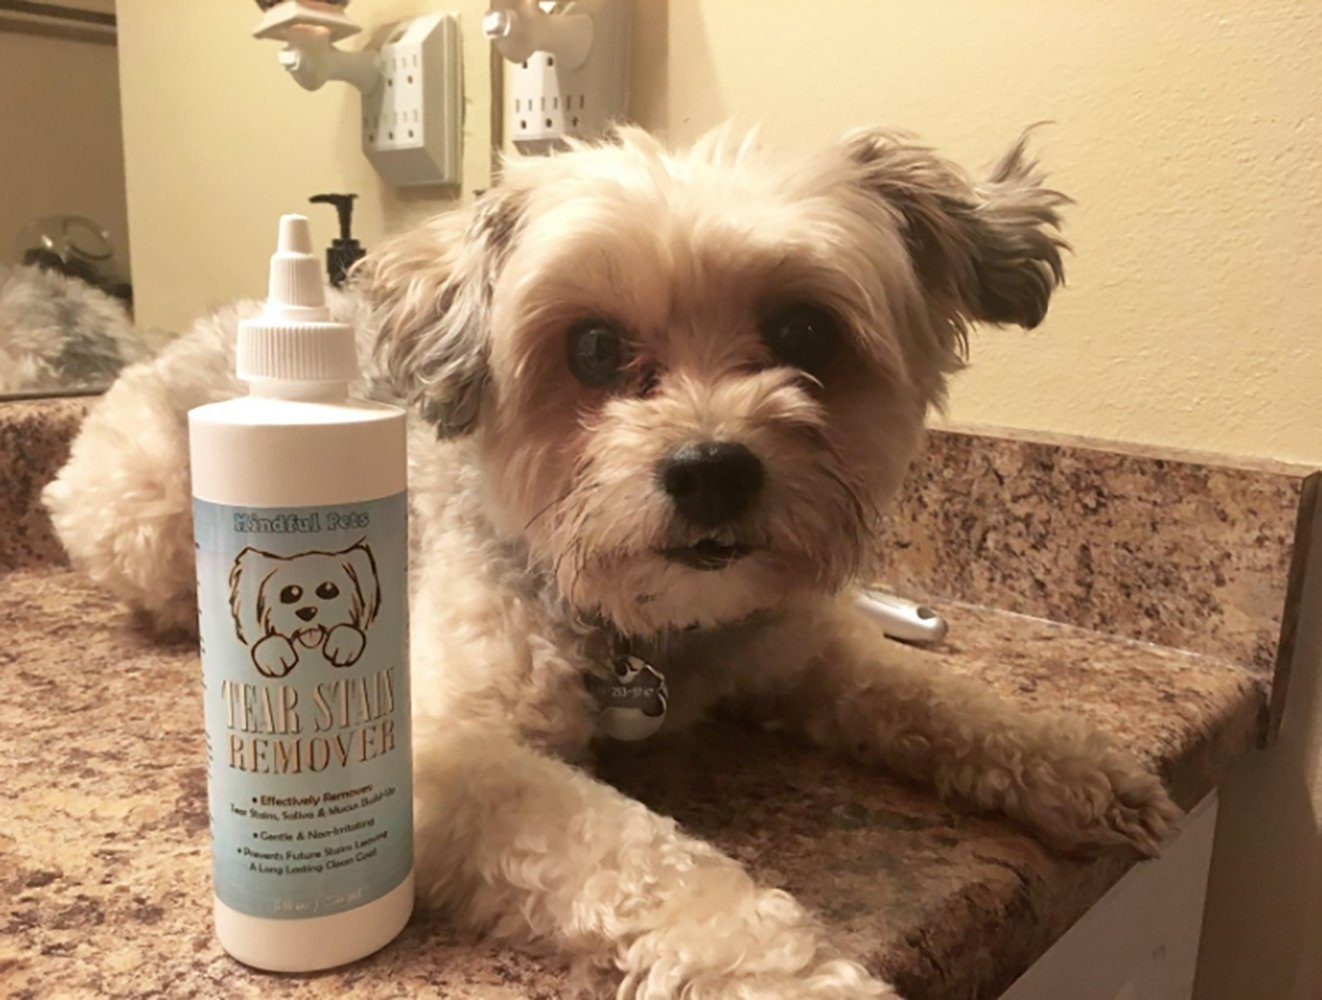 Mindful Pets Dog Tear Stain Remover 8oz Chihuahua Kingdom